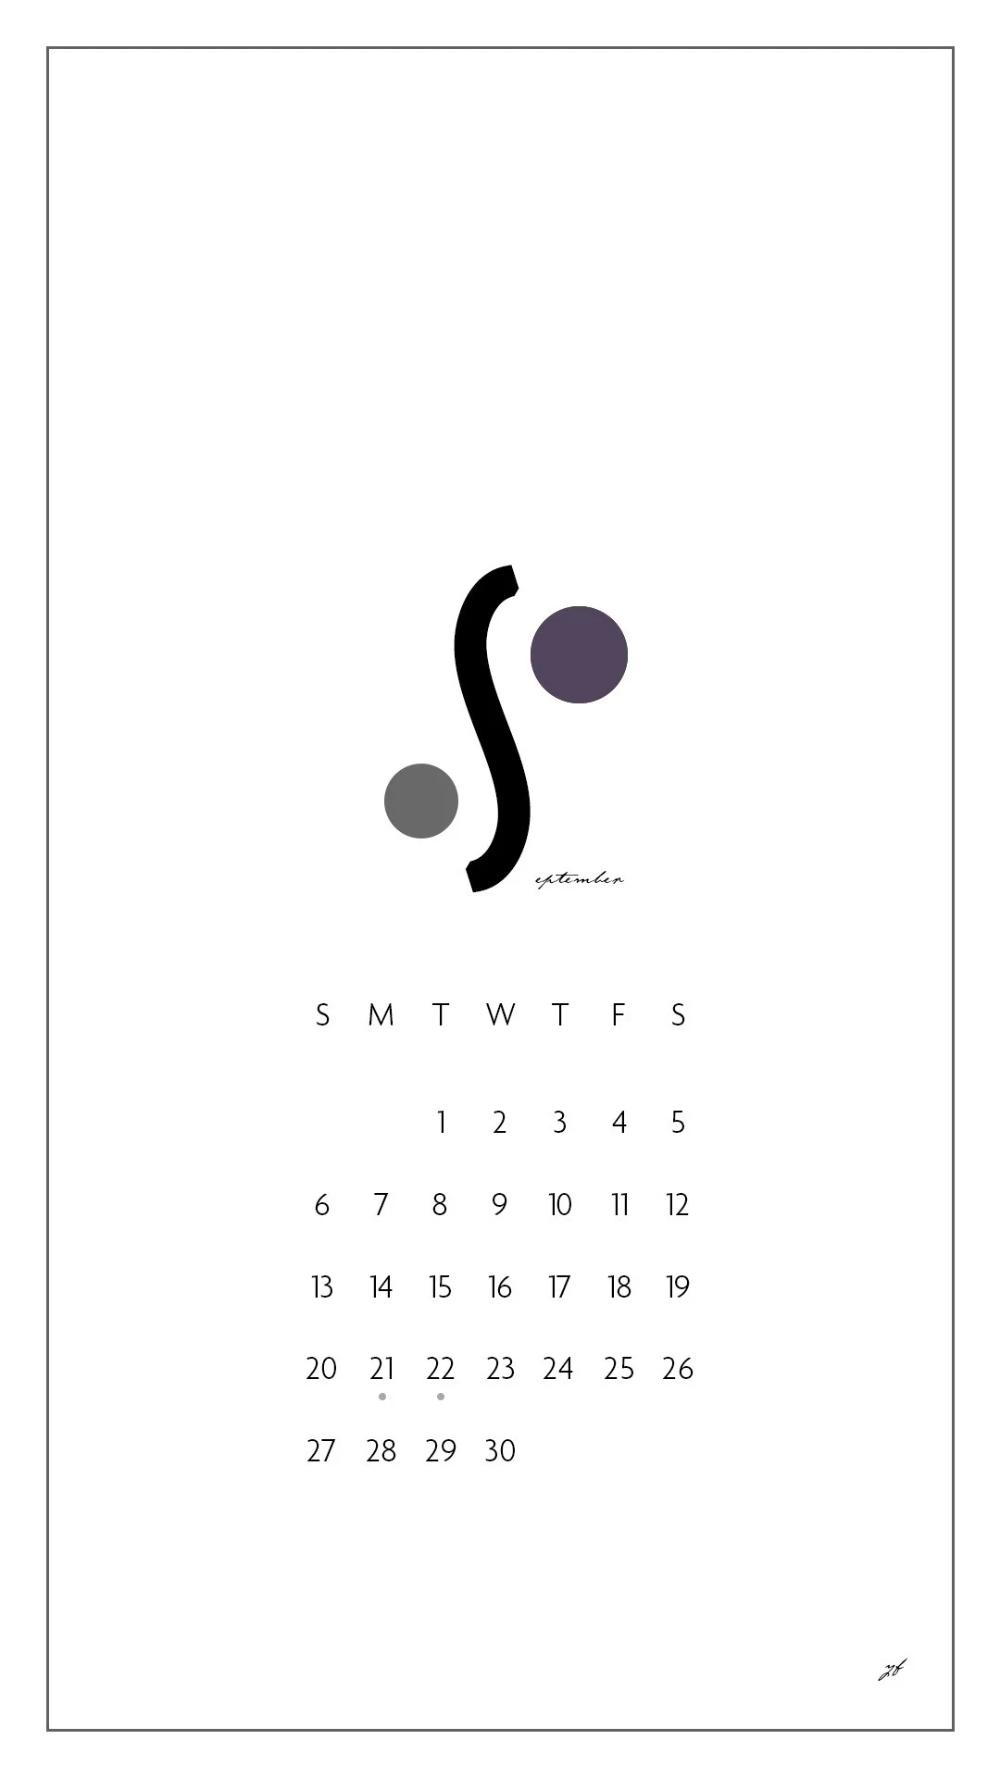 Free Iphone September Calendar 𝗬 𝗙 Note カレンダー 壁紙